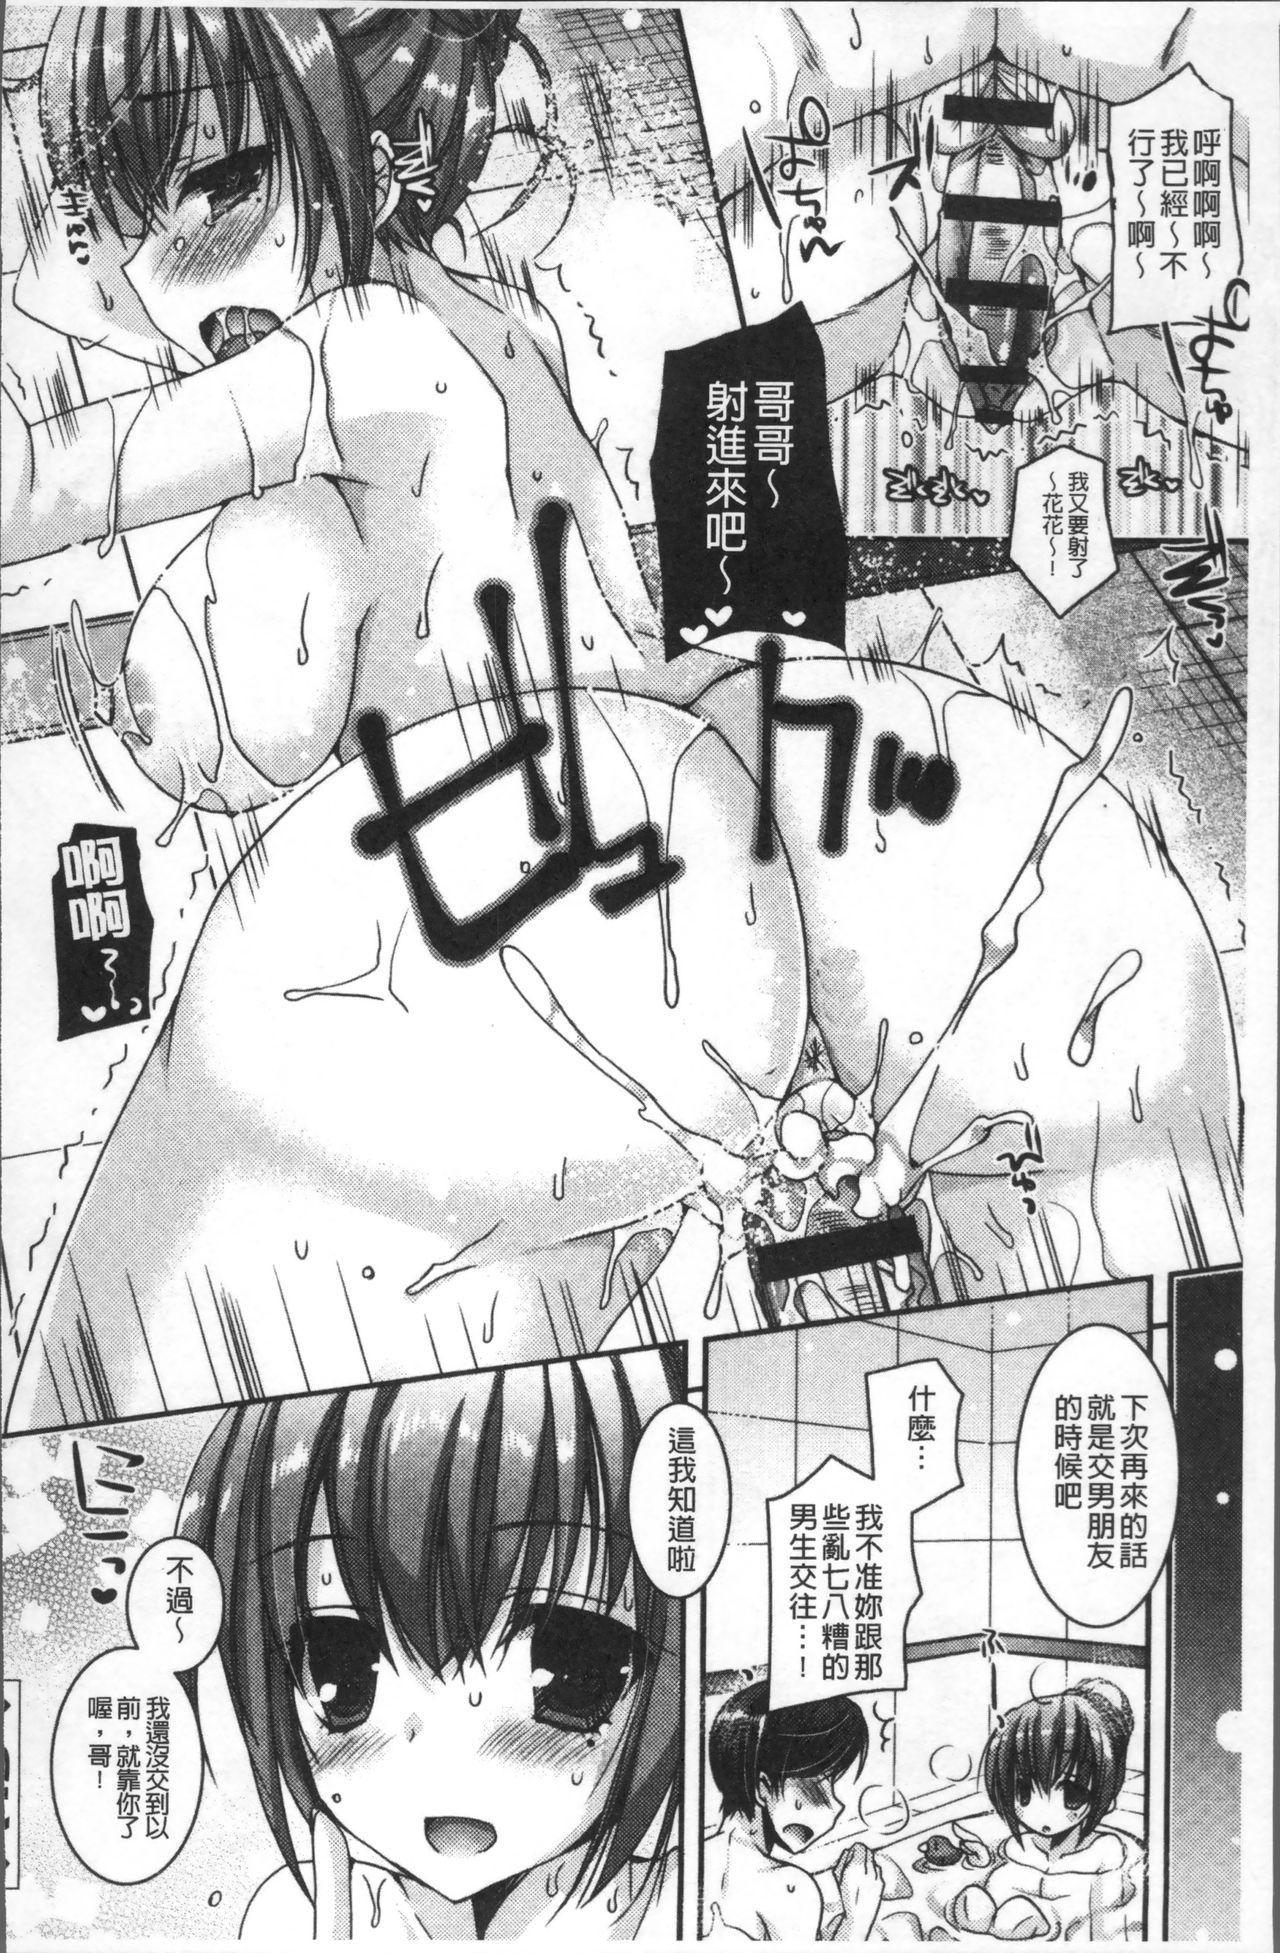 [Ueda Rieko] Doutei Killer na Imouto ~Bitch-kei Kyonyuu Gal ni Yarare Houdai~ | 童貞殺手的妹妹~被淫女系巨乳小辣妹給玩弄個過癮~ [Chinese] 159